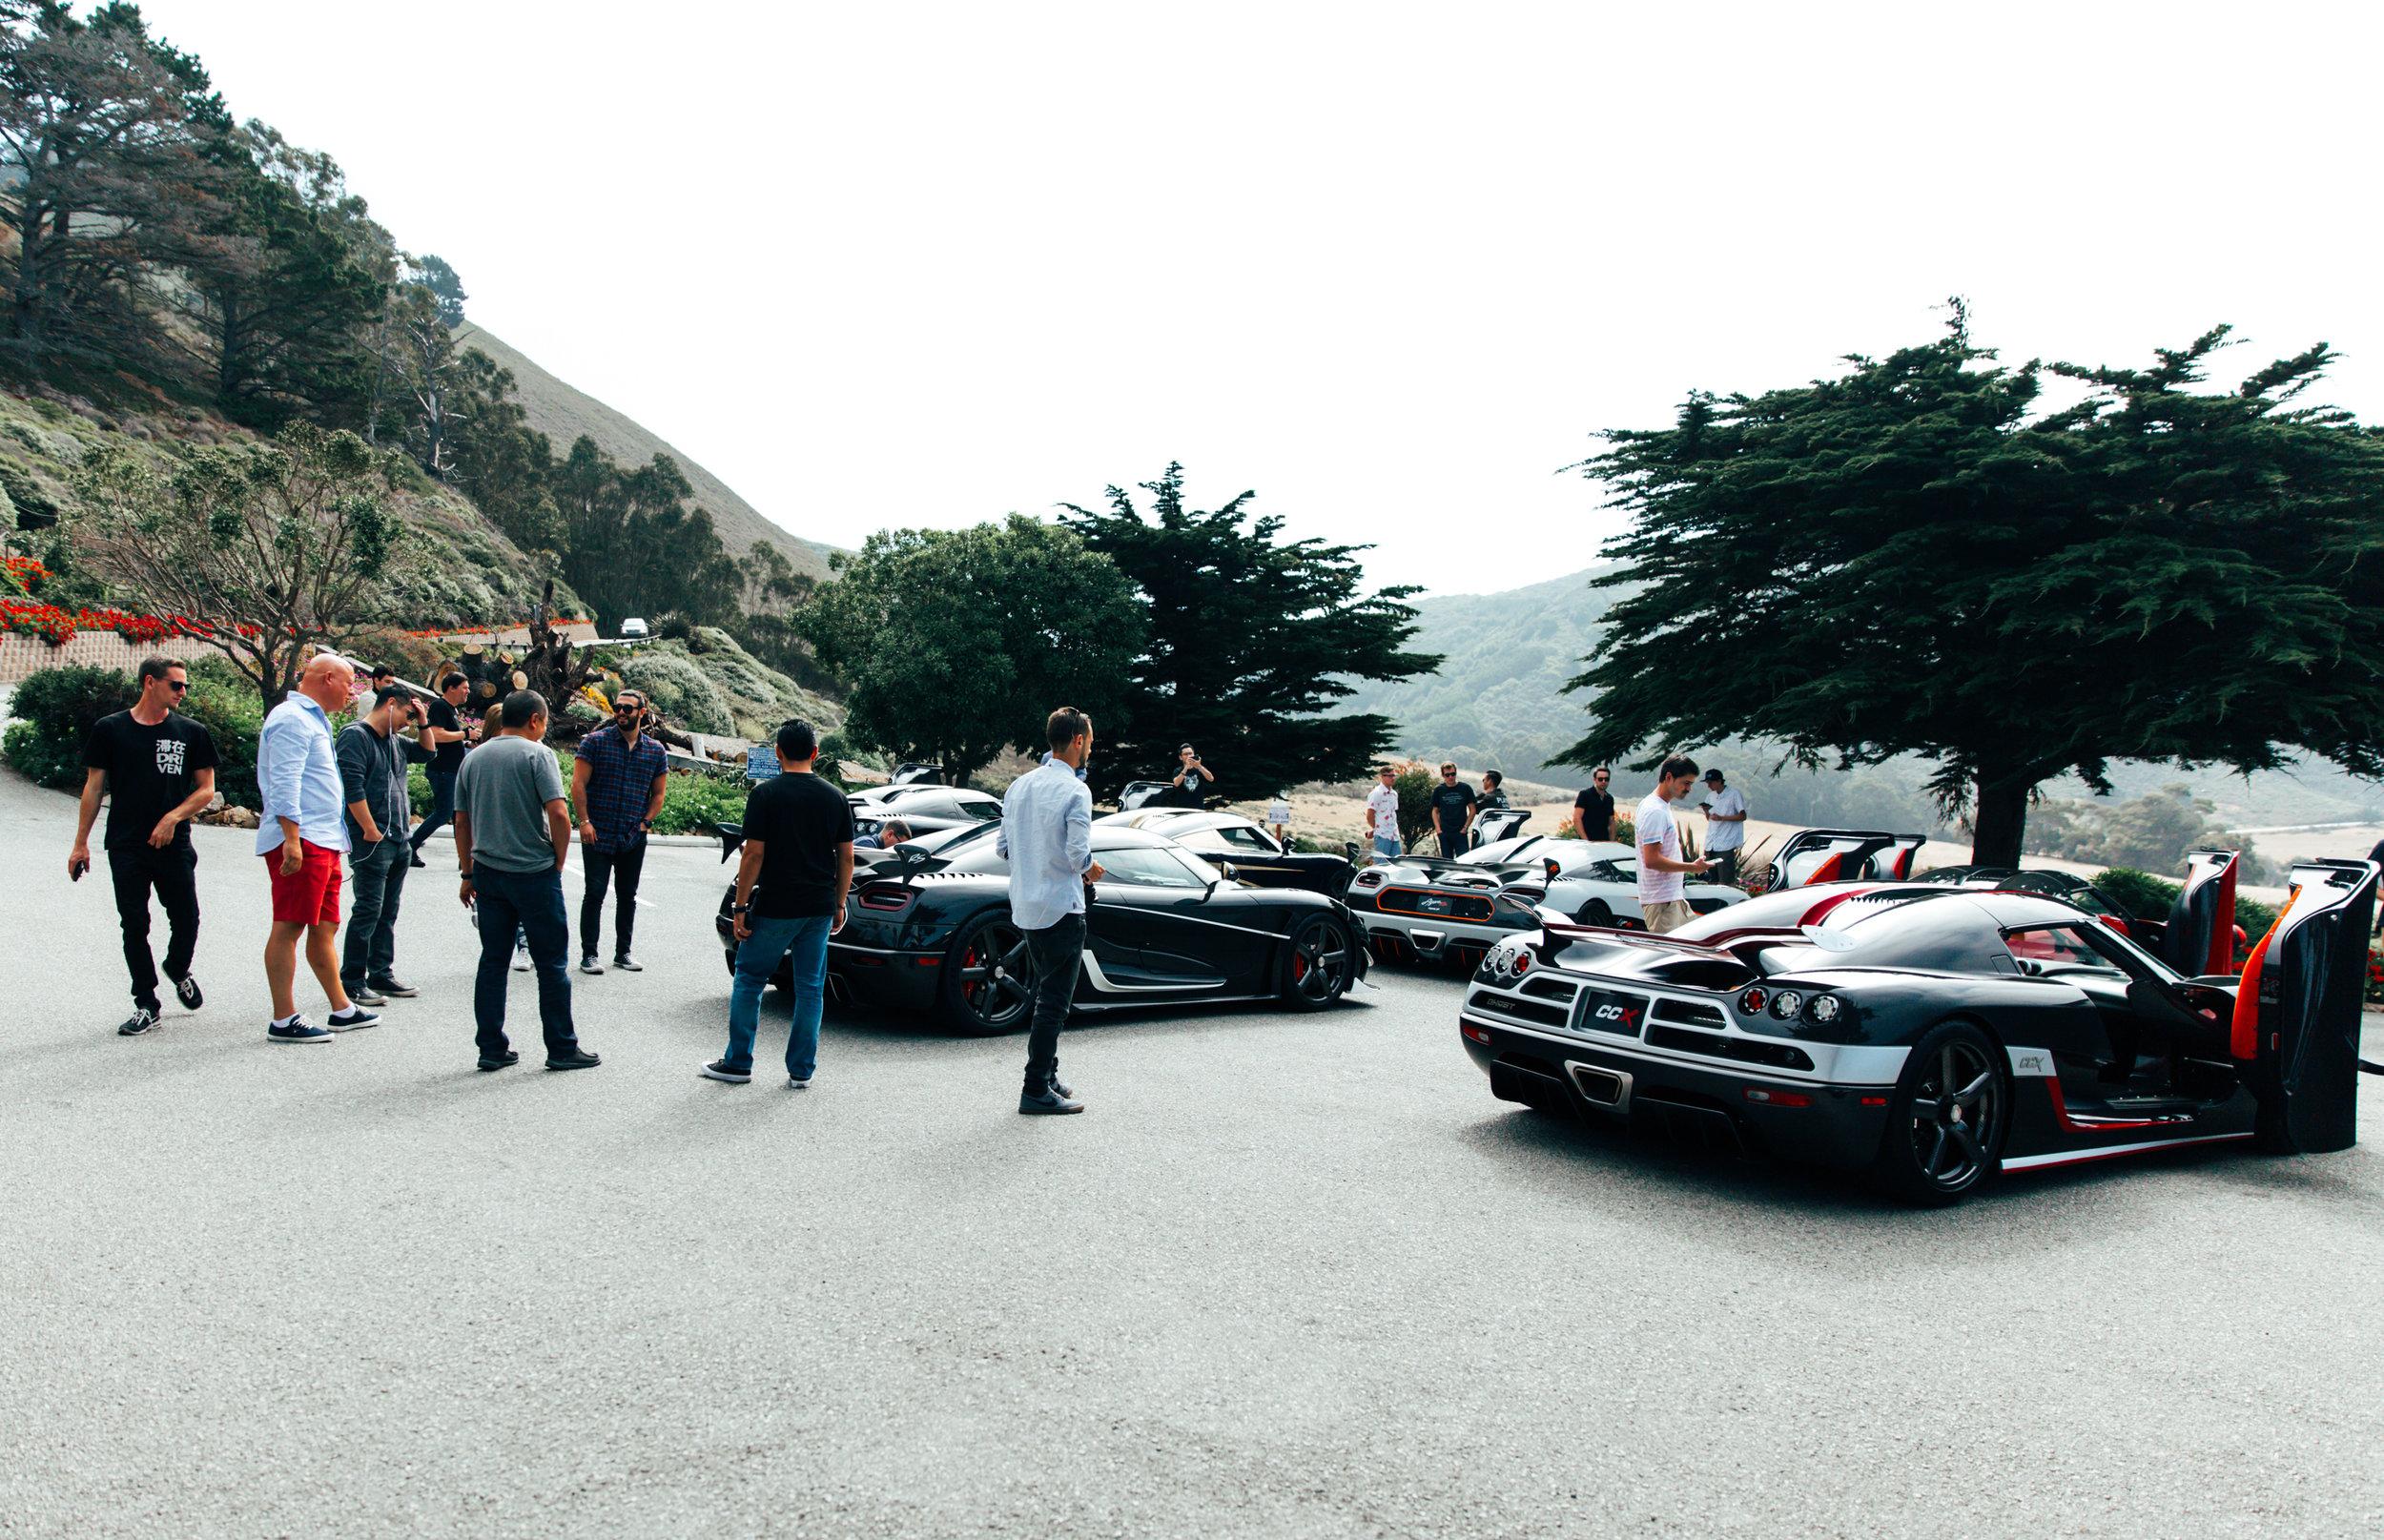 Stay_Driven_Monterey_Car_Week_Koenigsegg-31.jpg